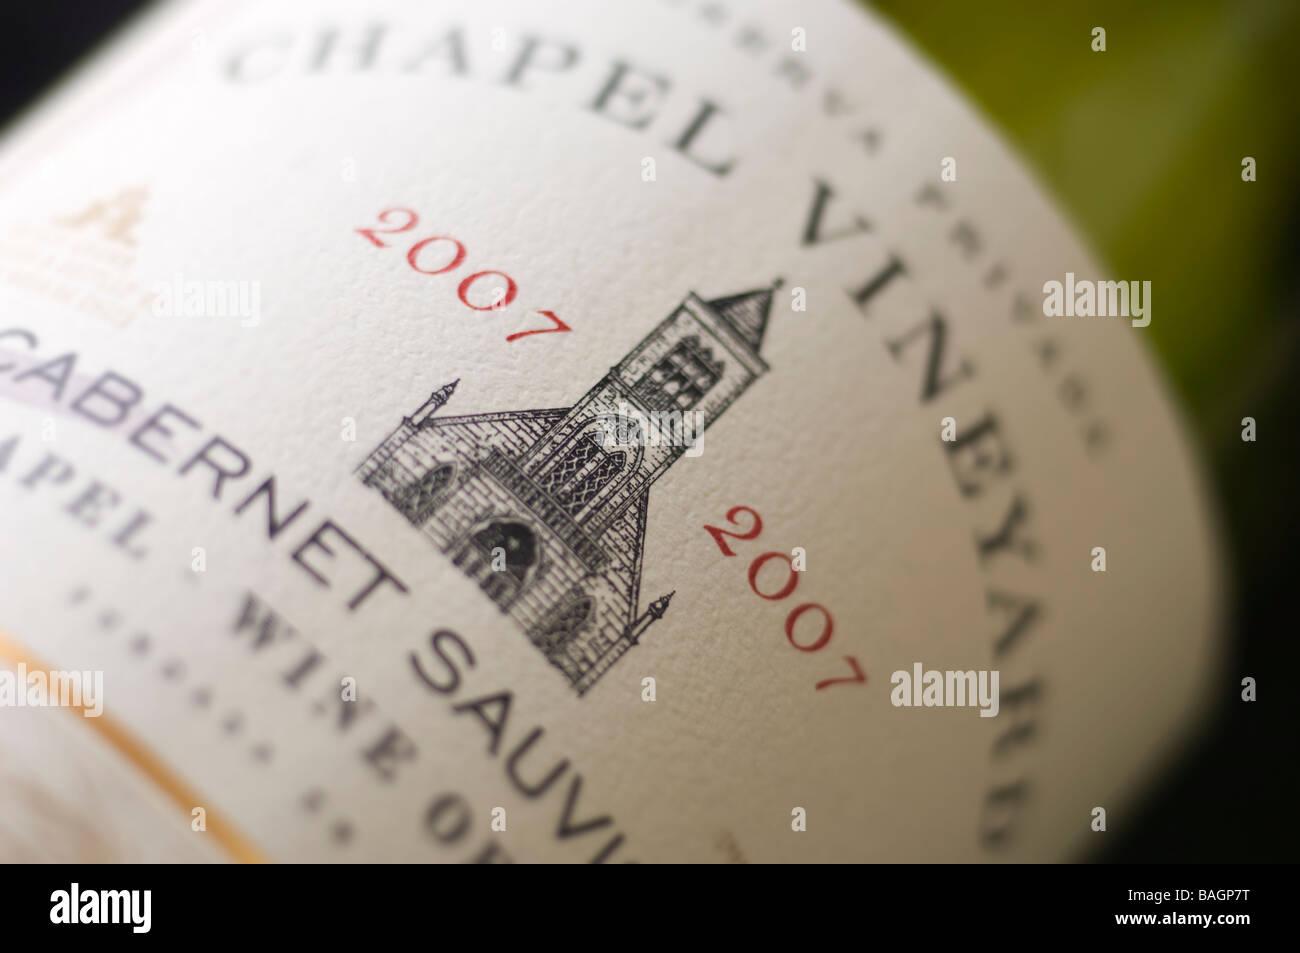 Los Rosales Kapelle Weinberg Cabernet Sauvignon Weinflasche Etikett closeup Stockbild